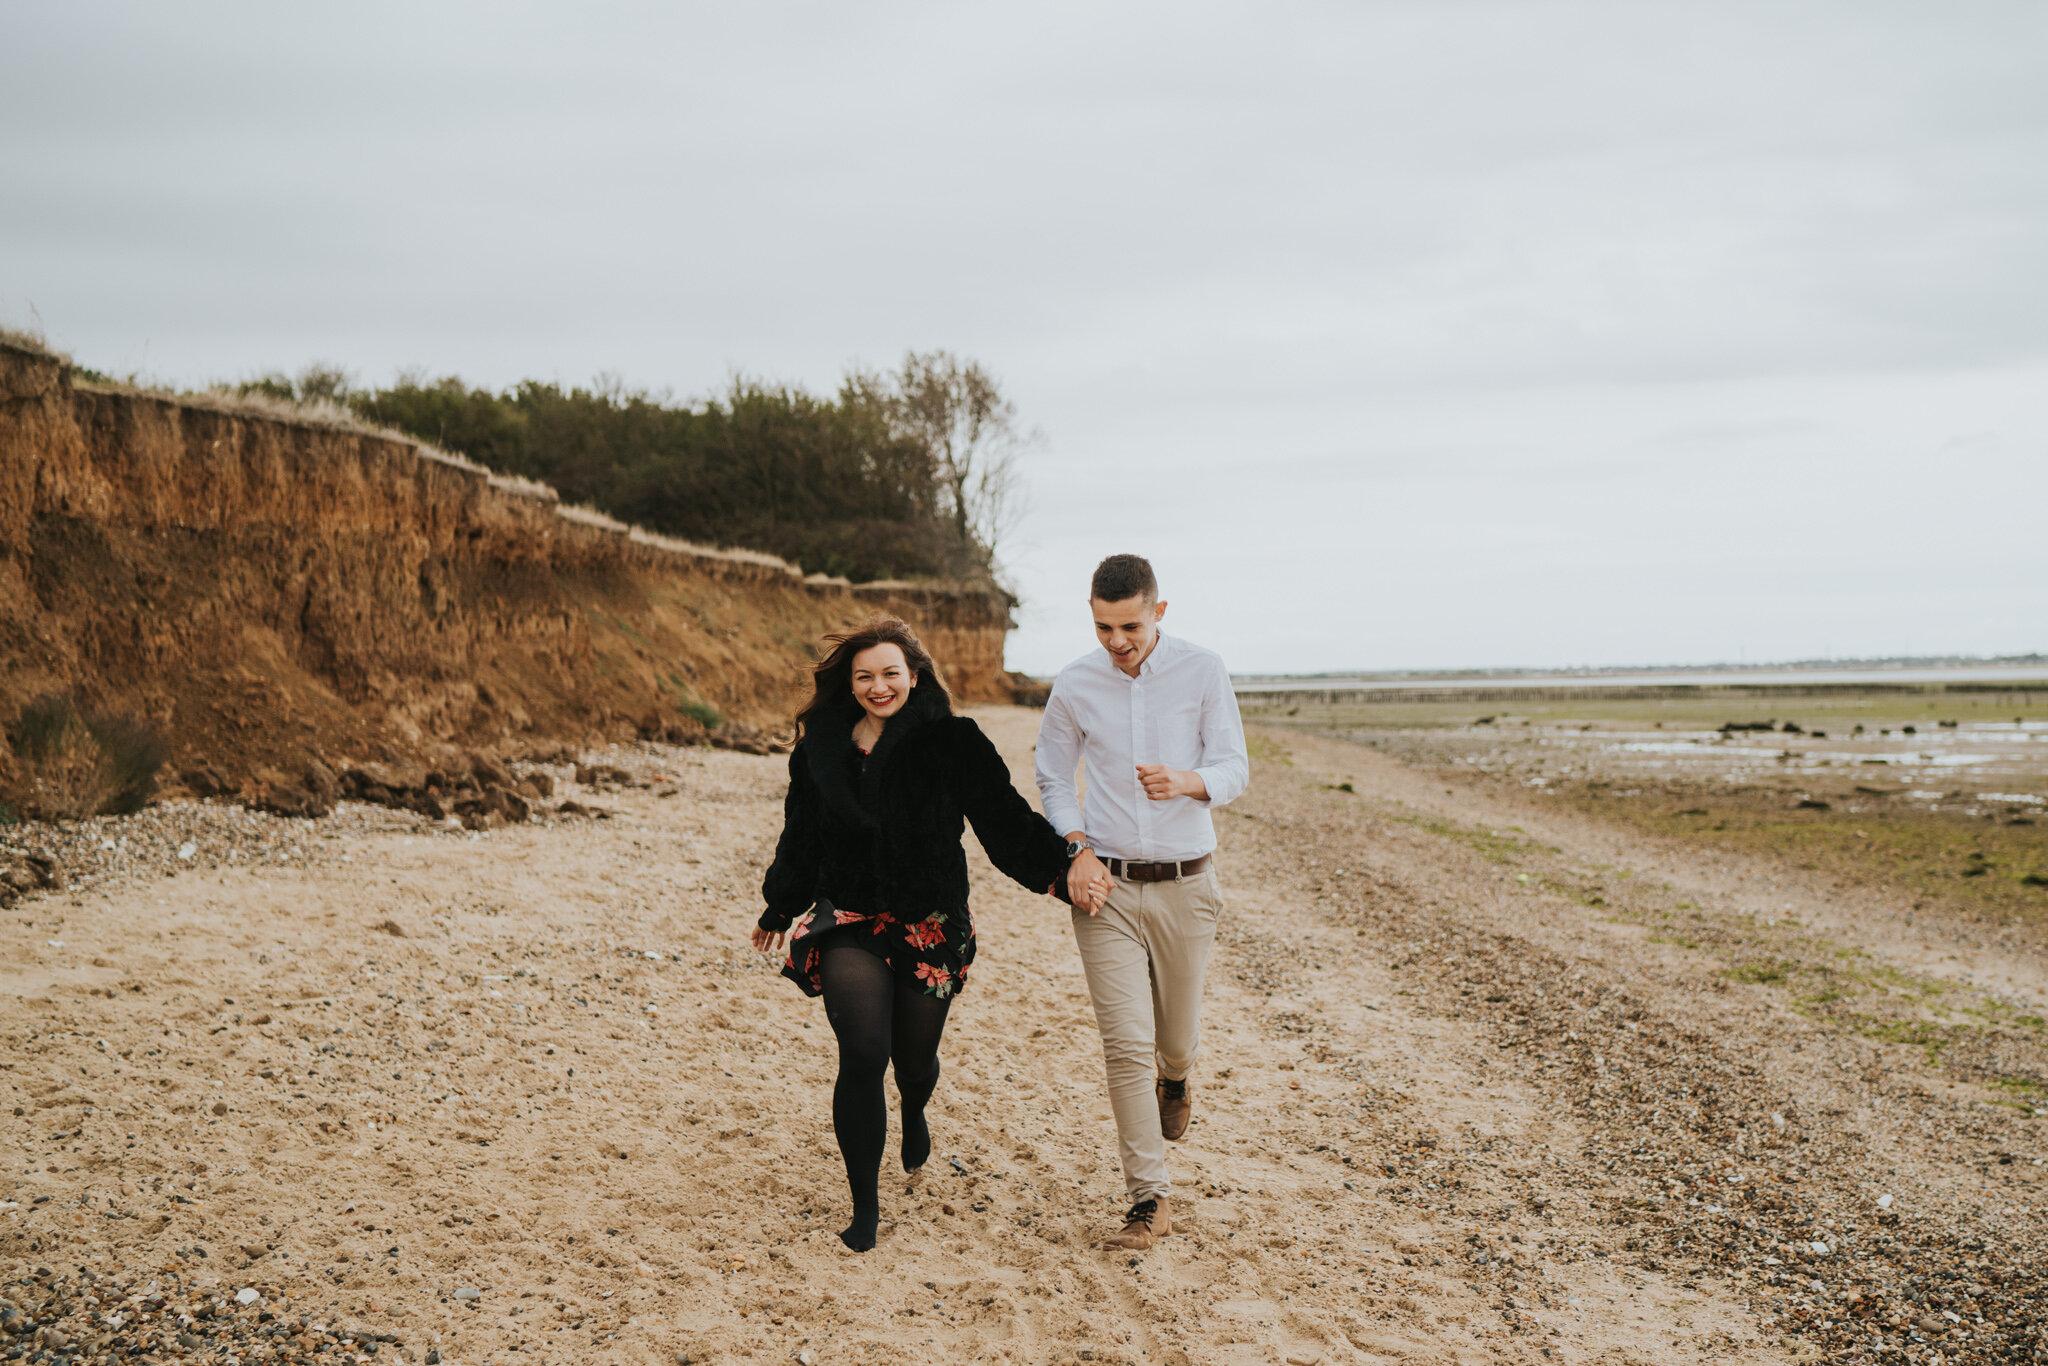 engagement-pre-wedding-hannah-michael-cudmore-grove-east-mersea-grace-elizabeth-colchester-essex-devon-suffolk-and-norfolk-alternative-wedding-and-family-photographer (33 of 51).jpg